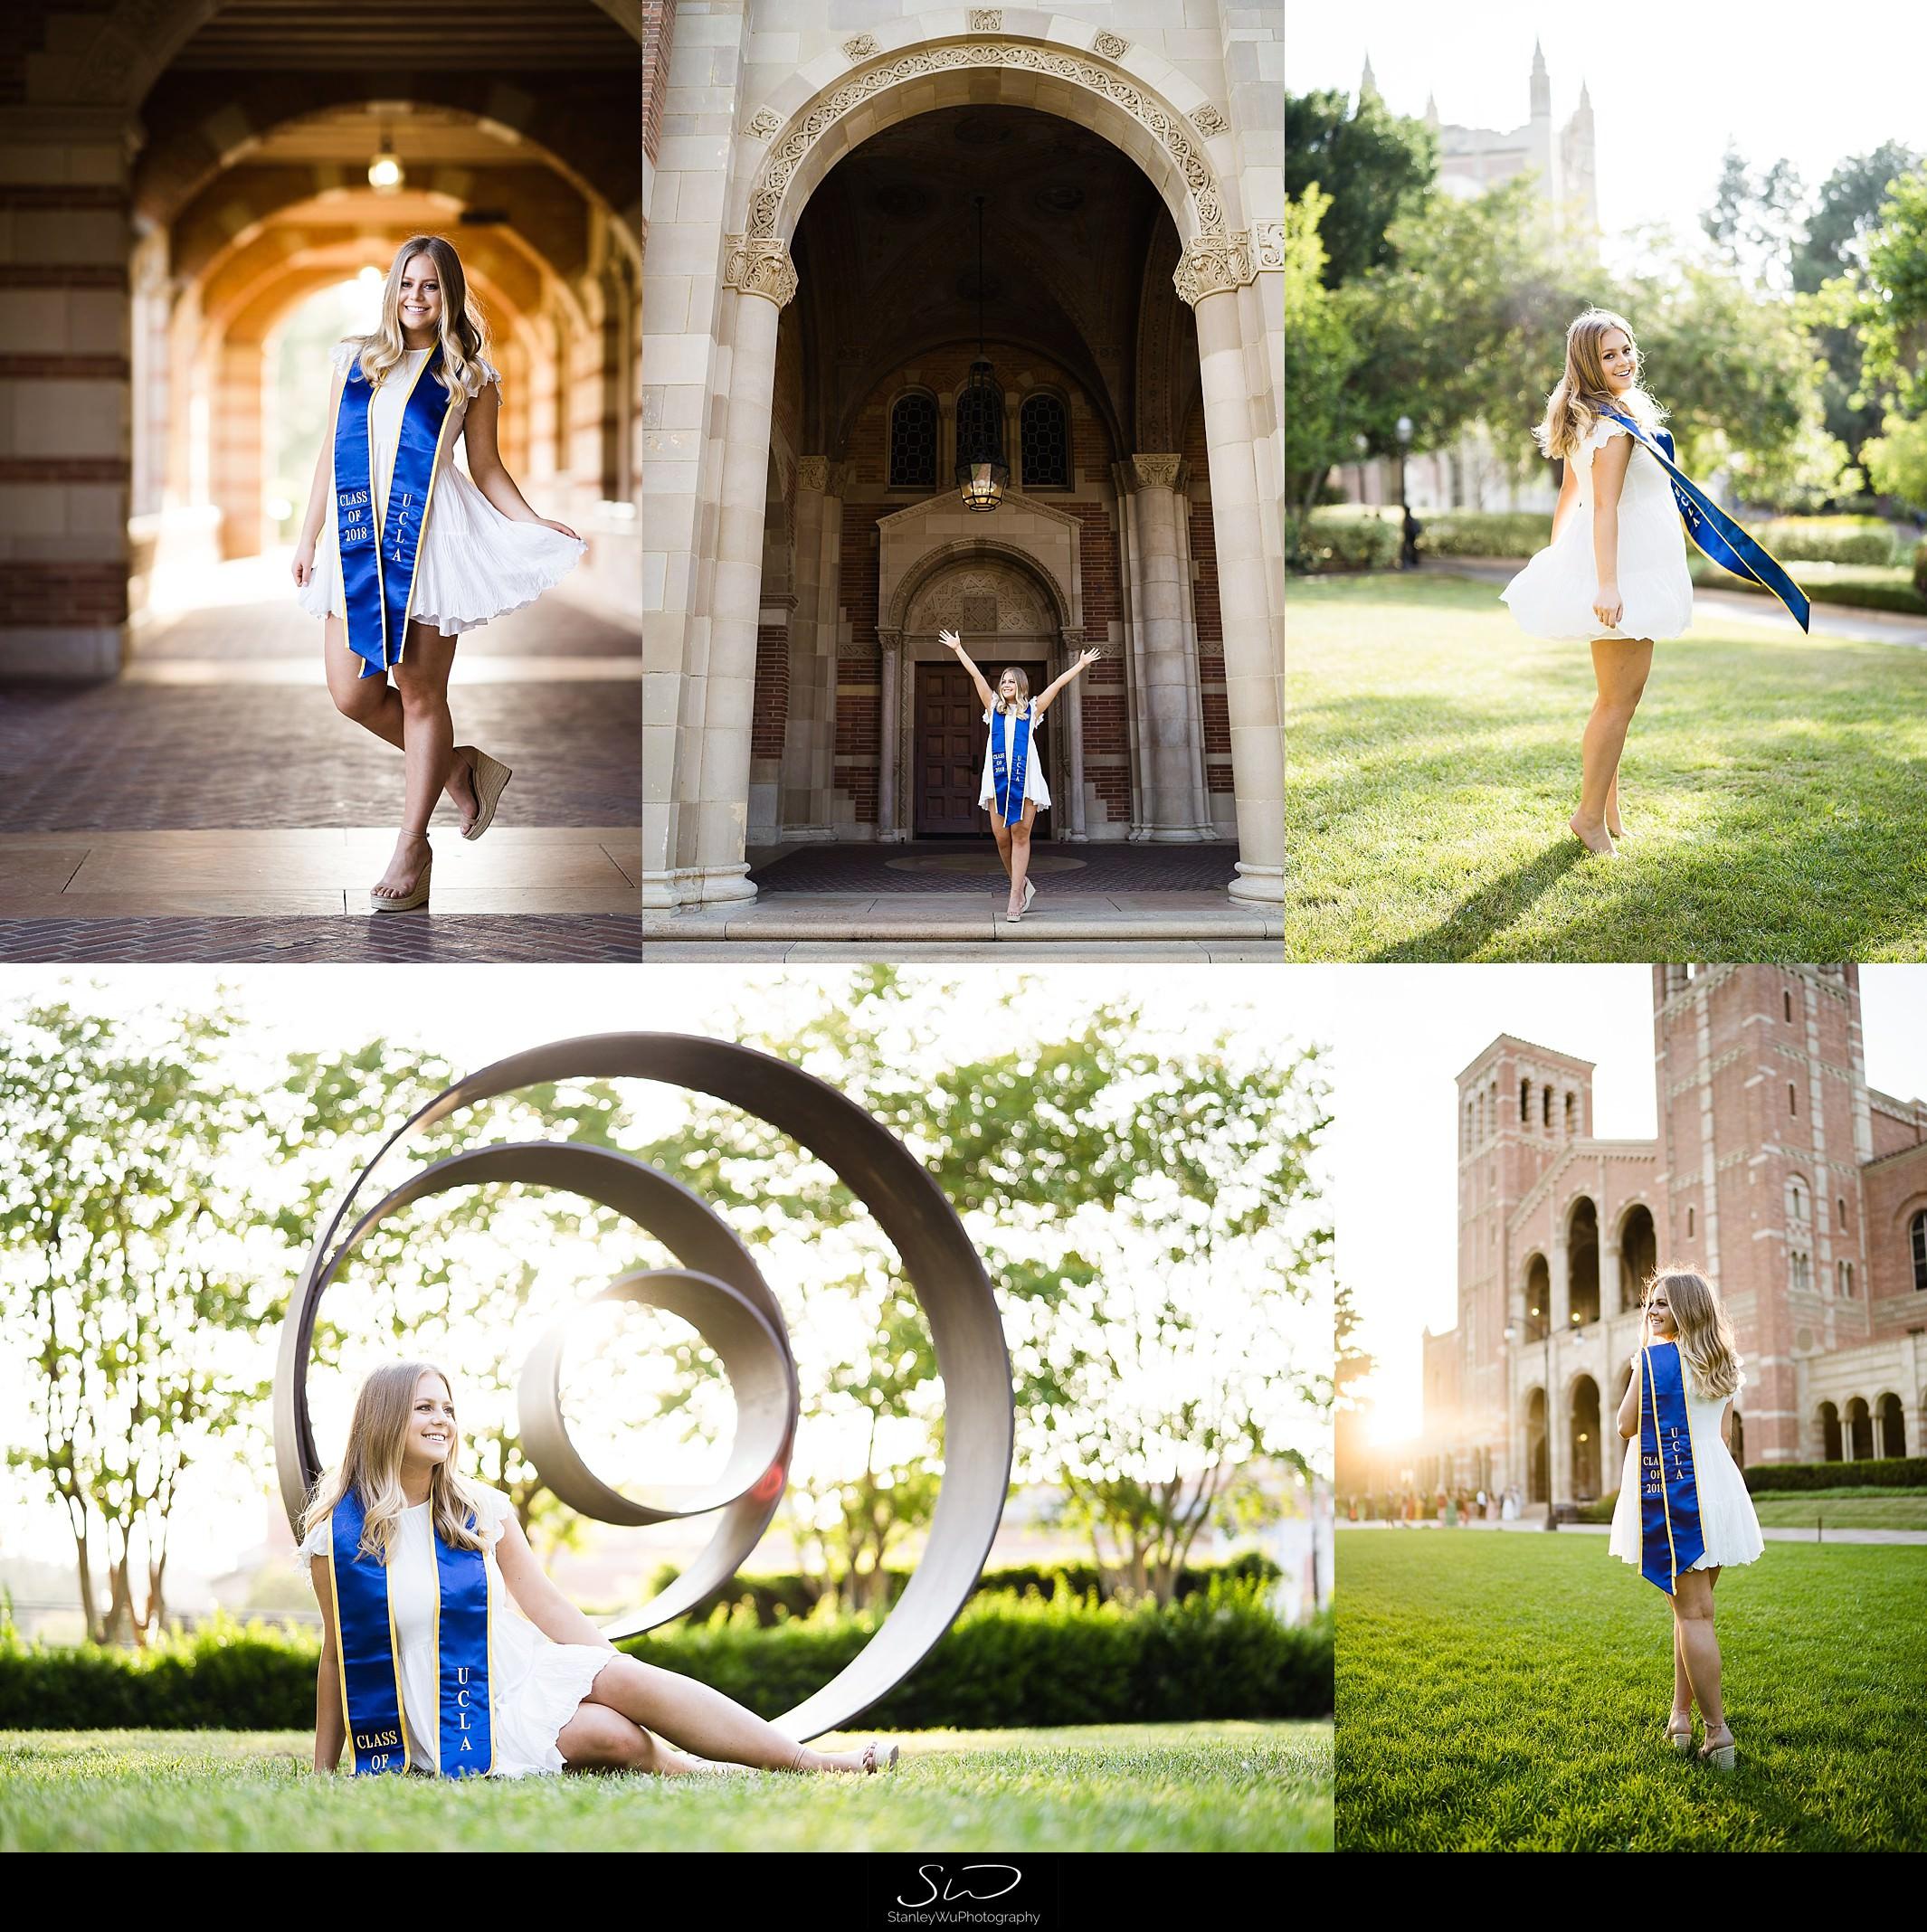 graduation-senior-portraits-los-angeles_0046.jpg